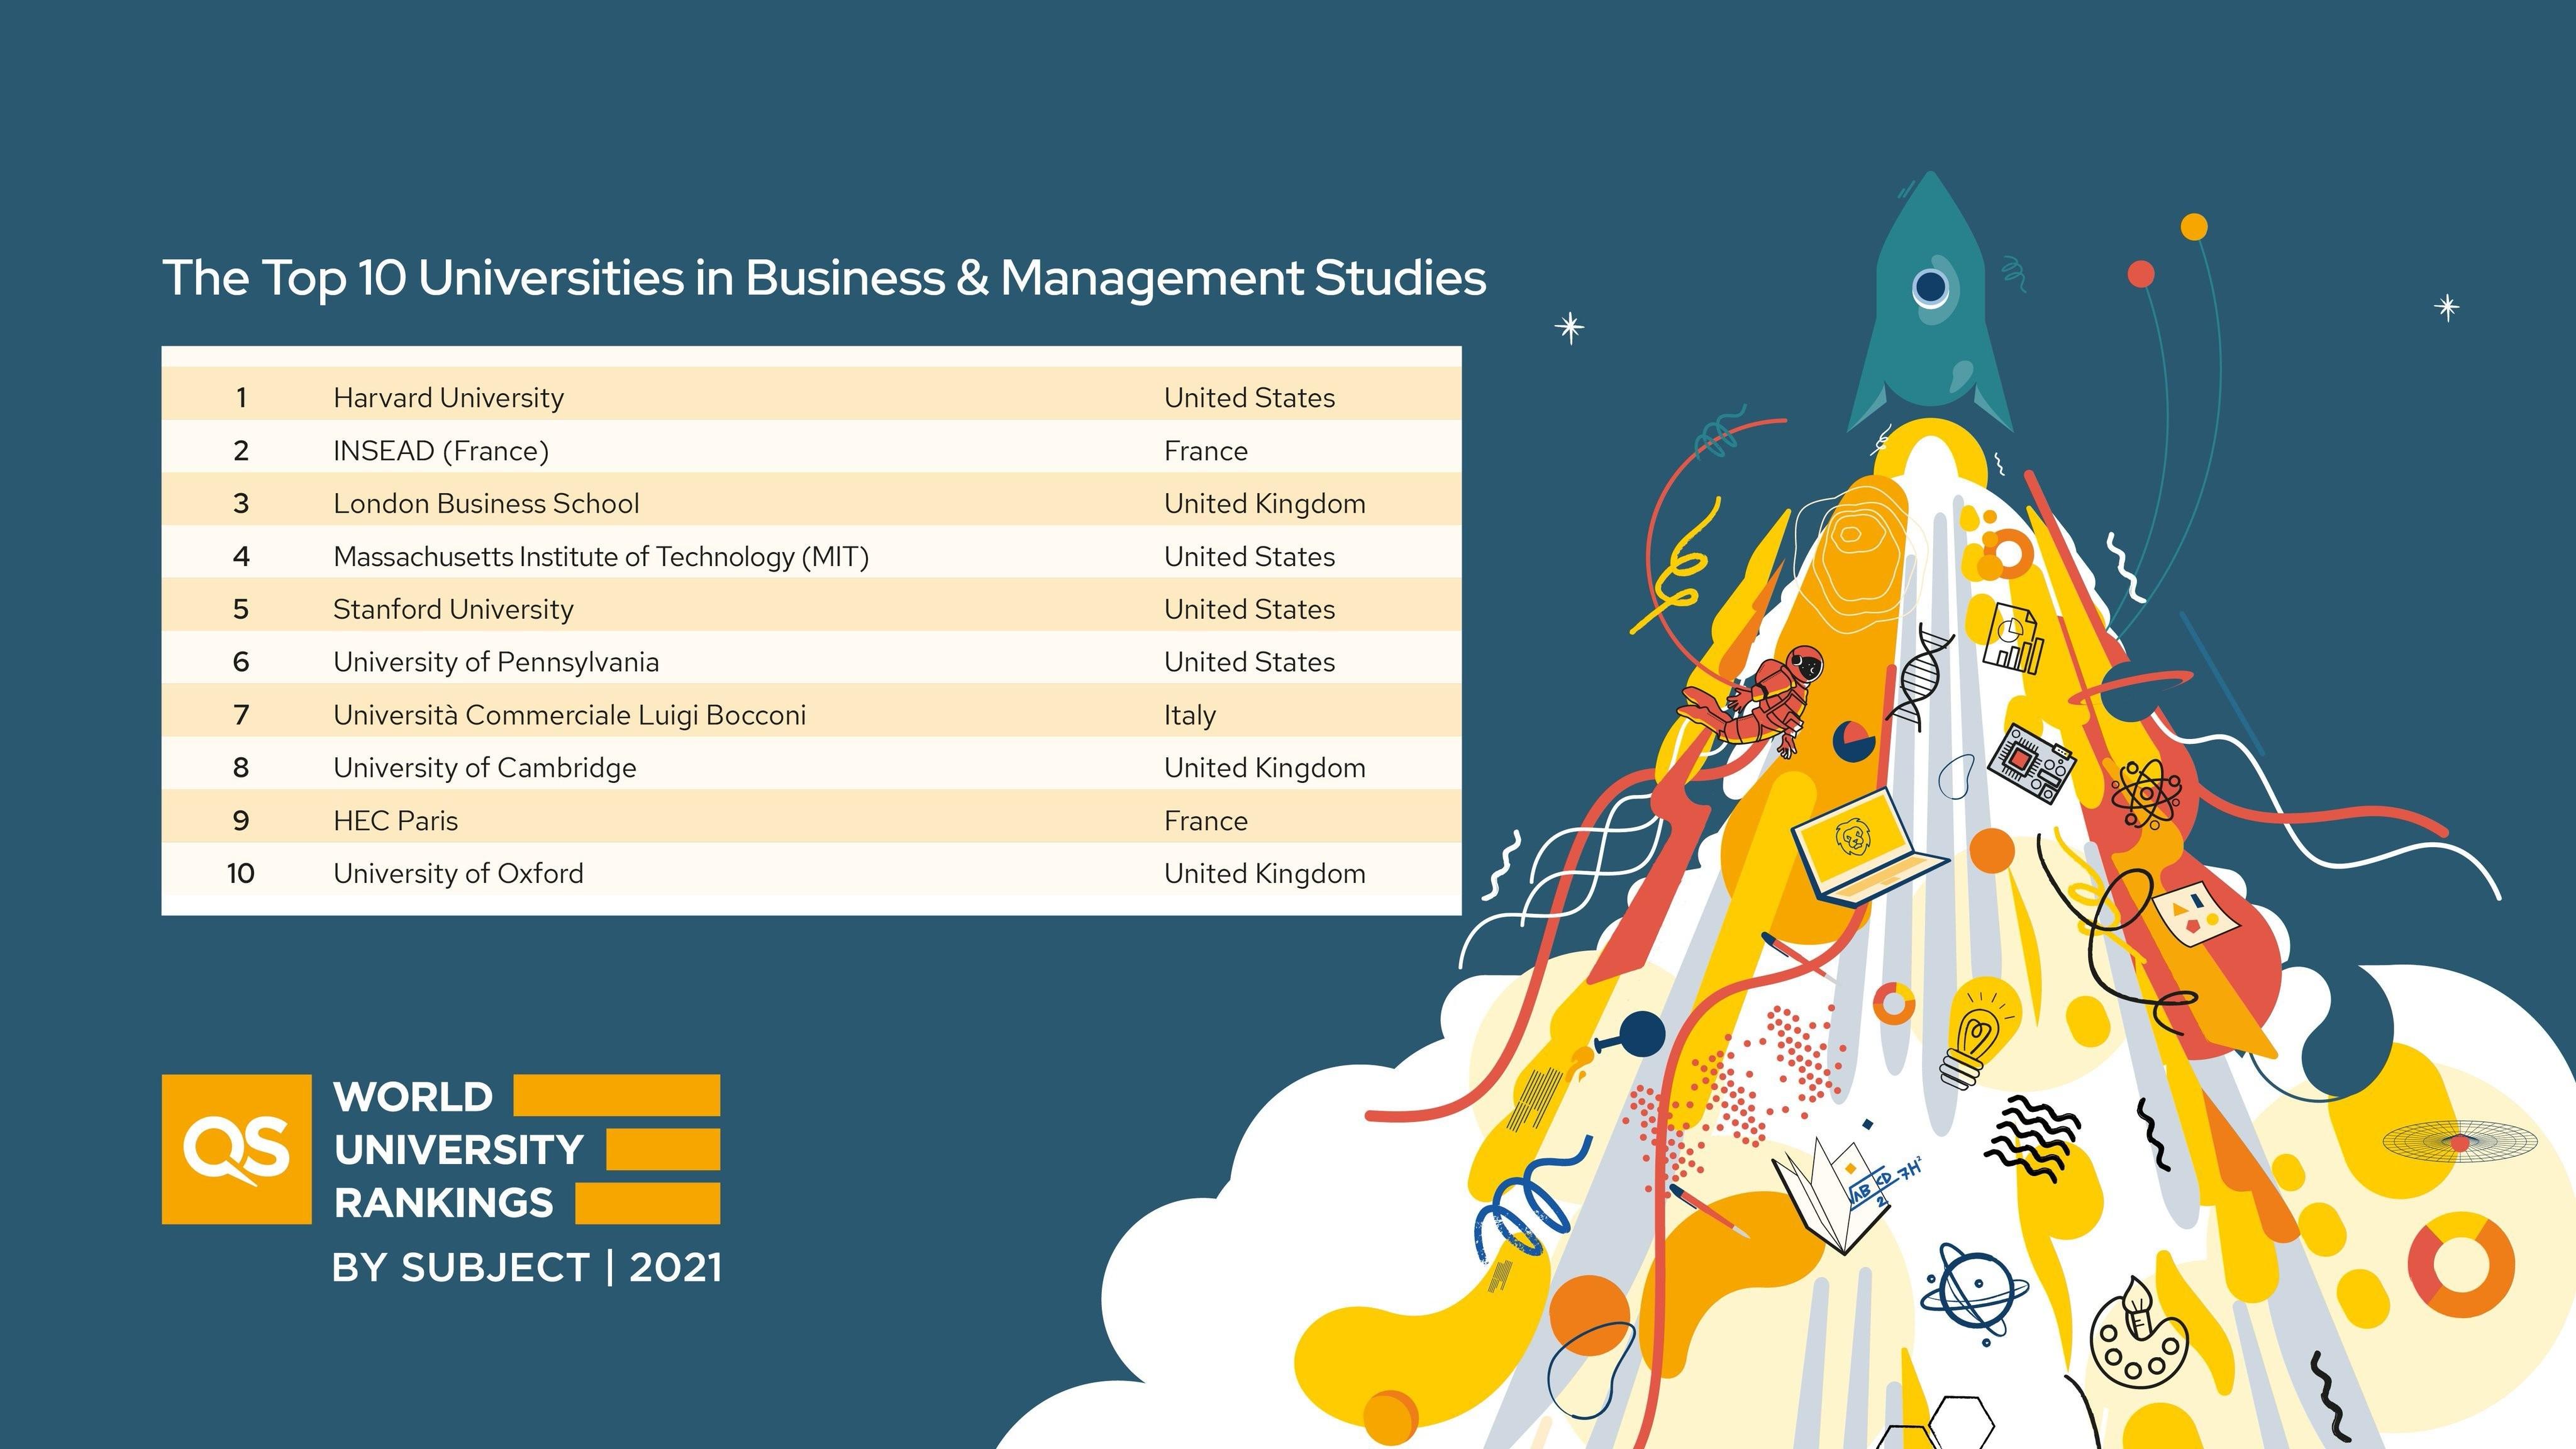 QS World University Rankings.